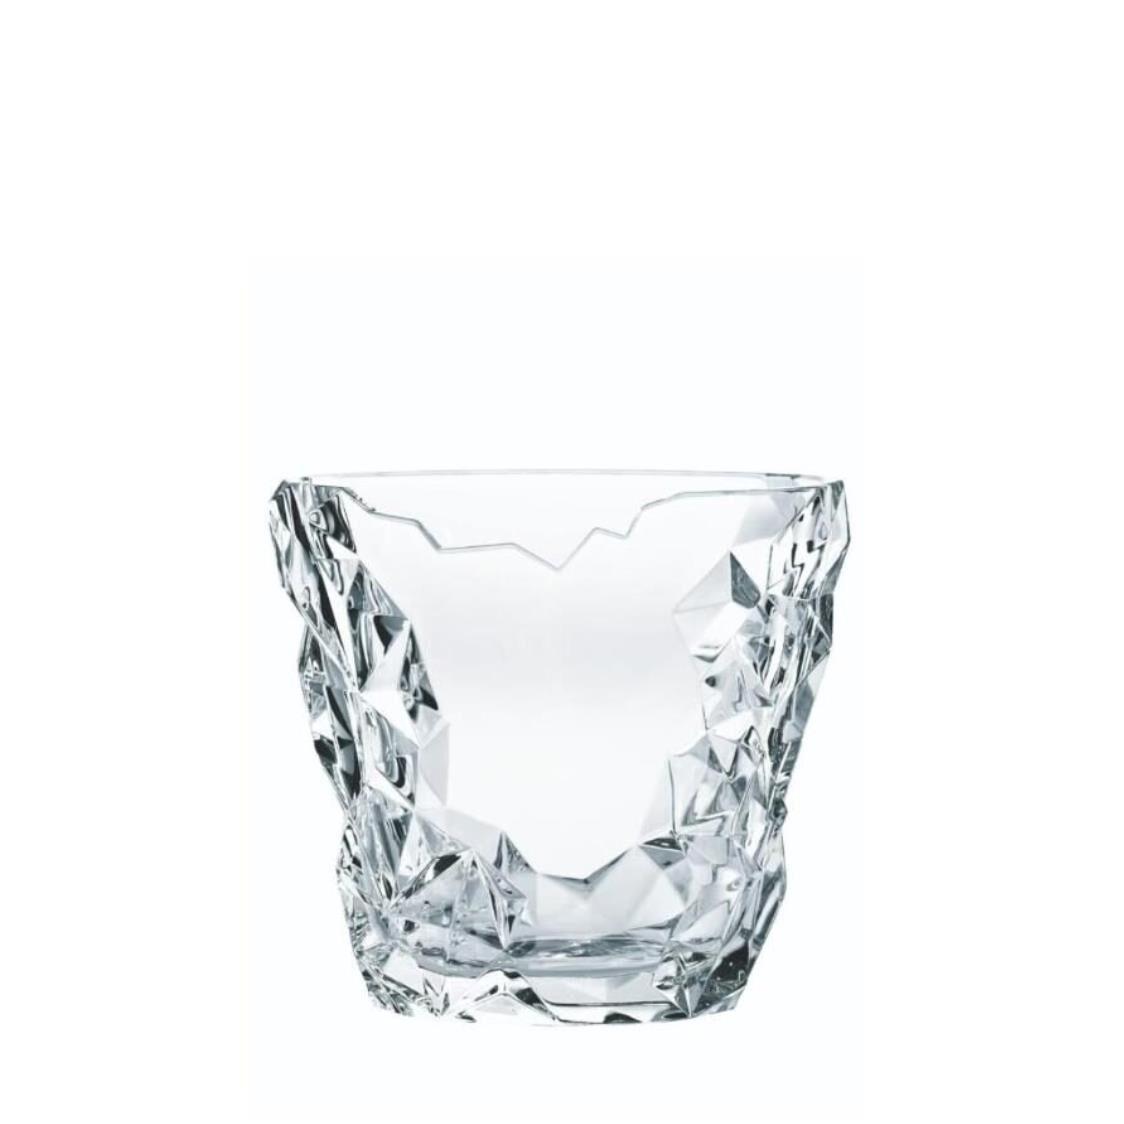 Nachtmann Lead Free Crystal Oval Vase H21cm Sculpture R-90053